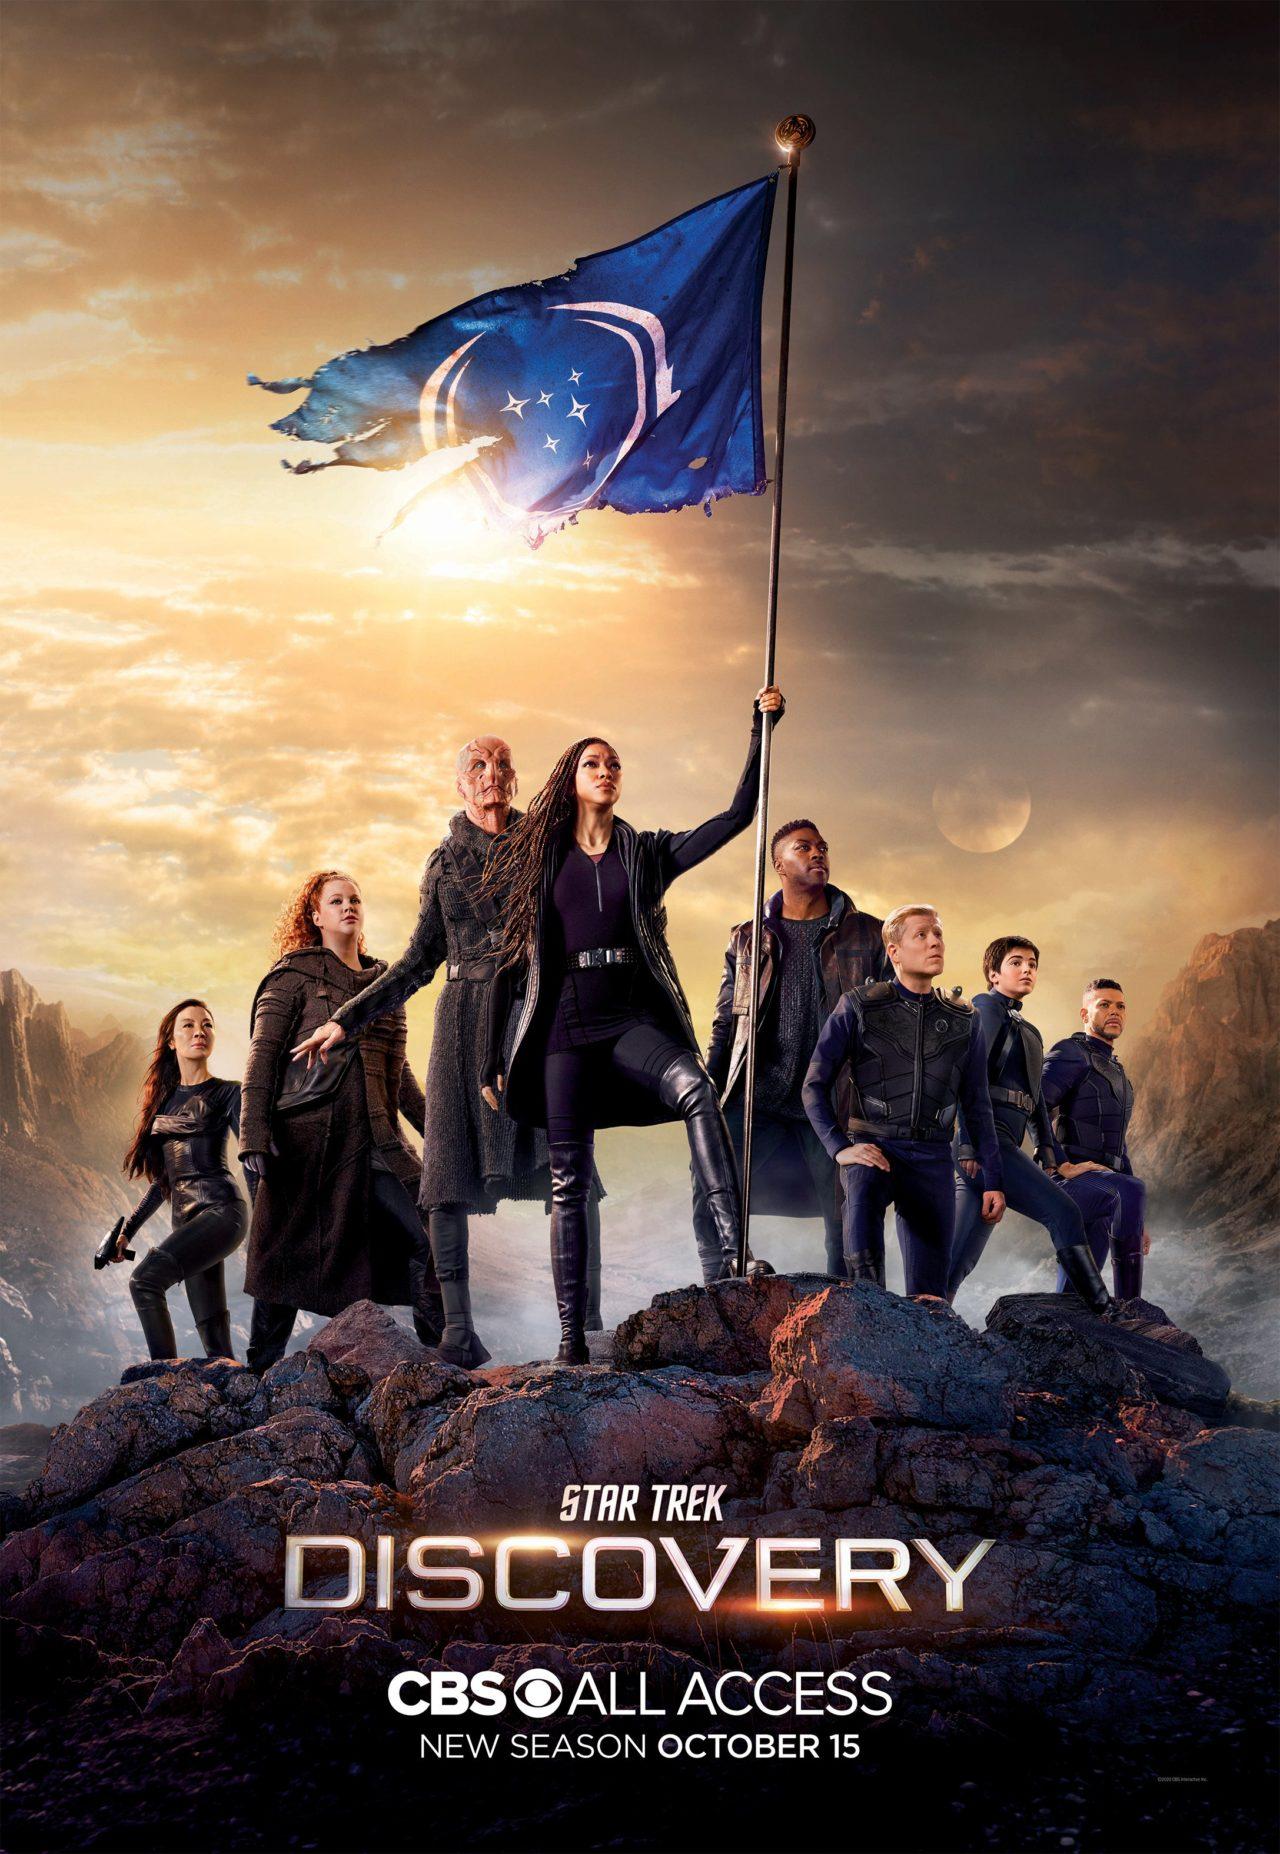 Star Trek Discovery Season 3 Poster